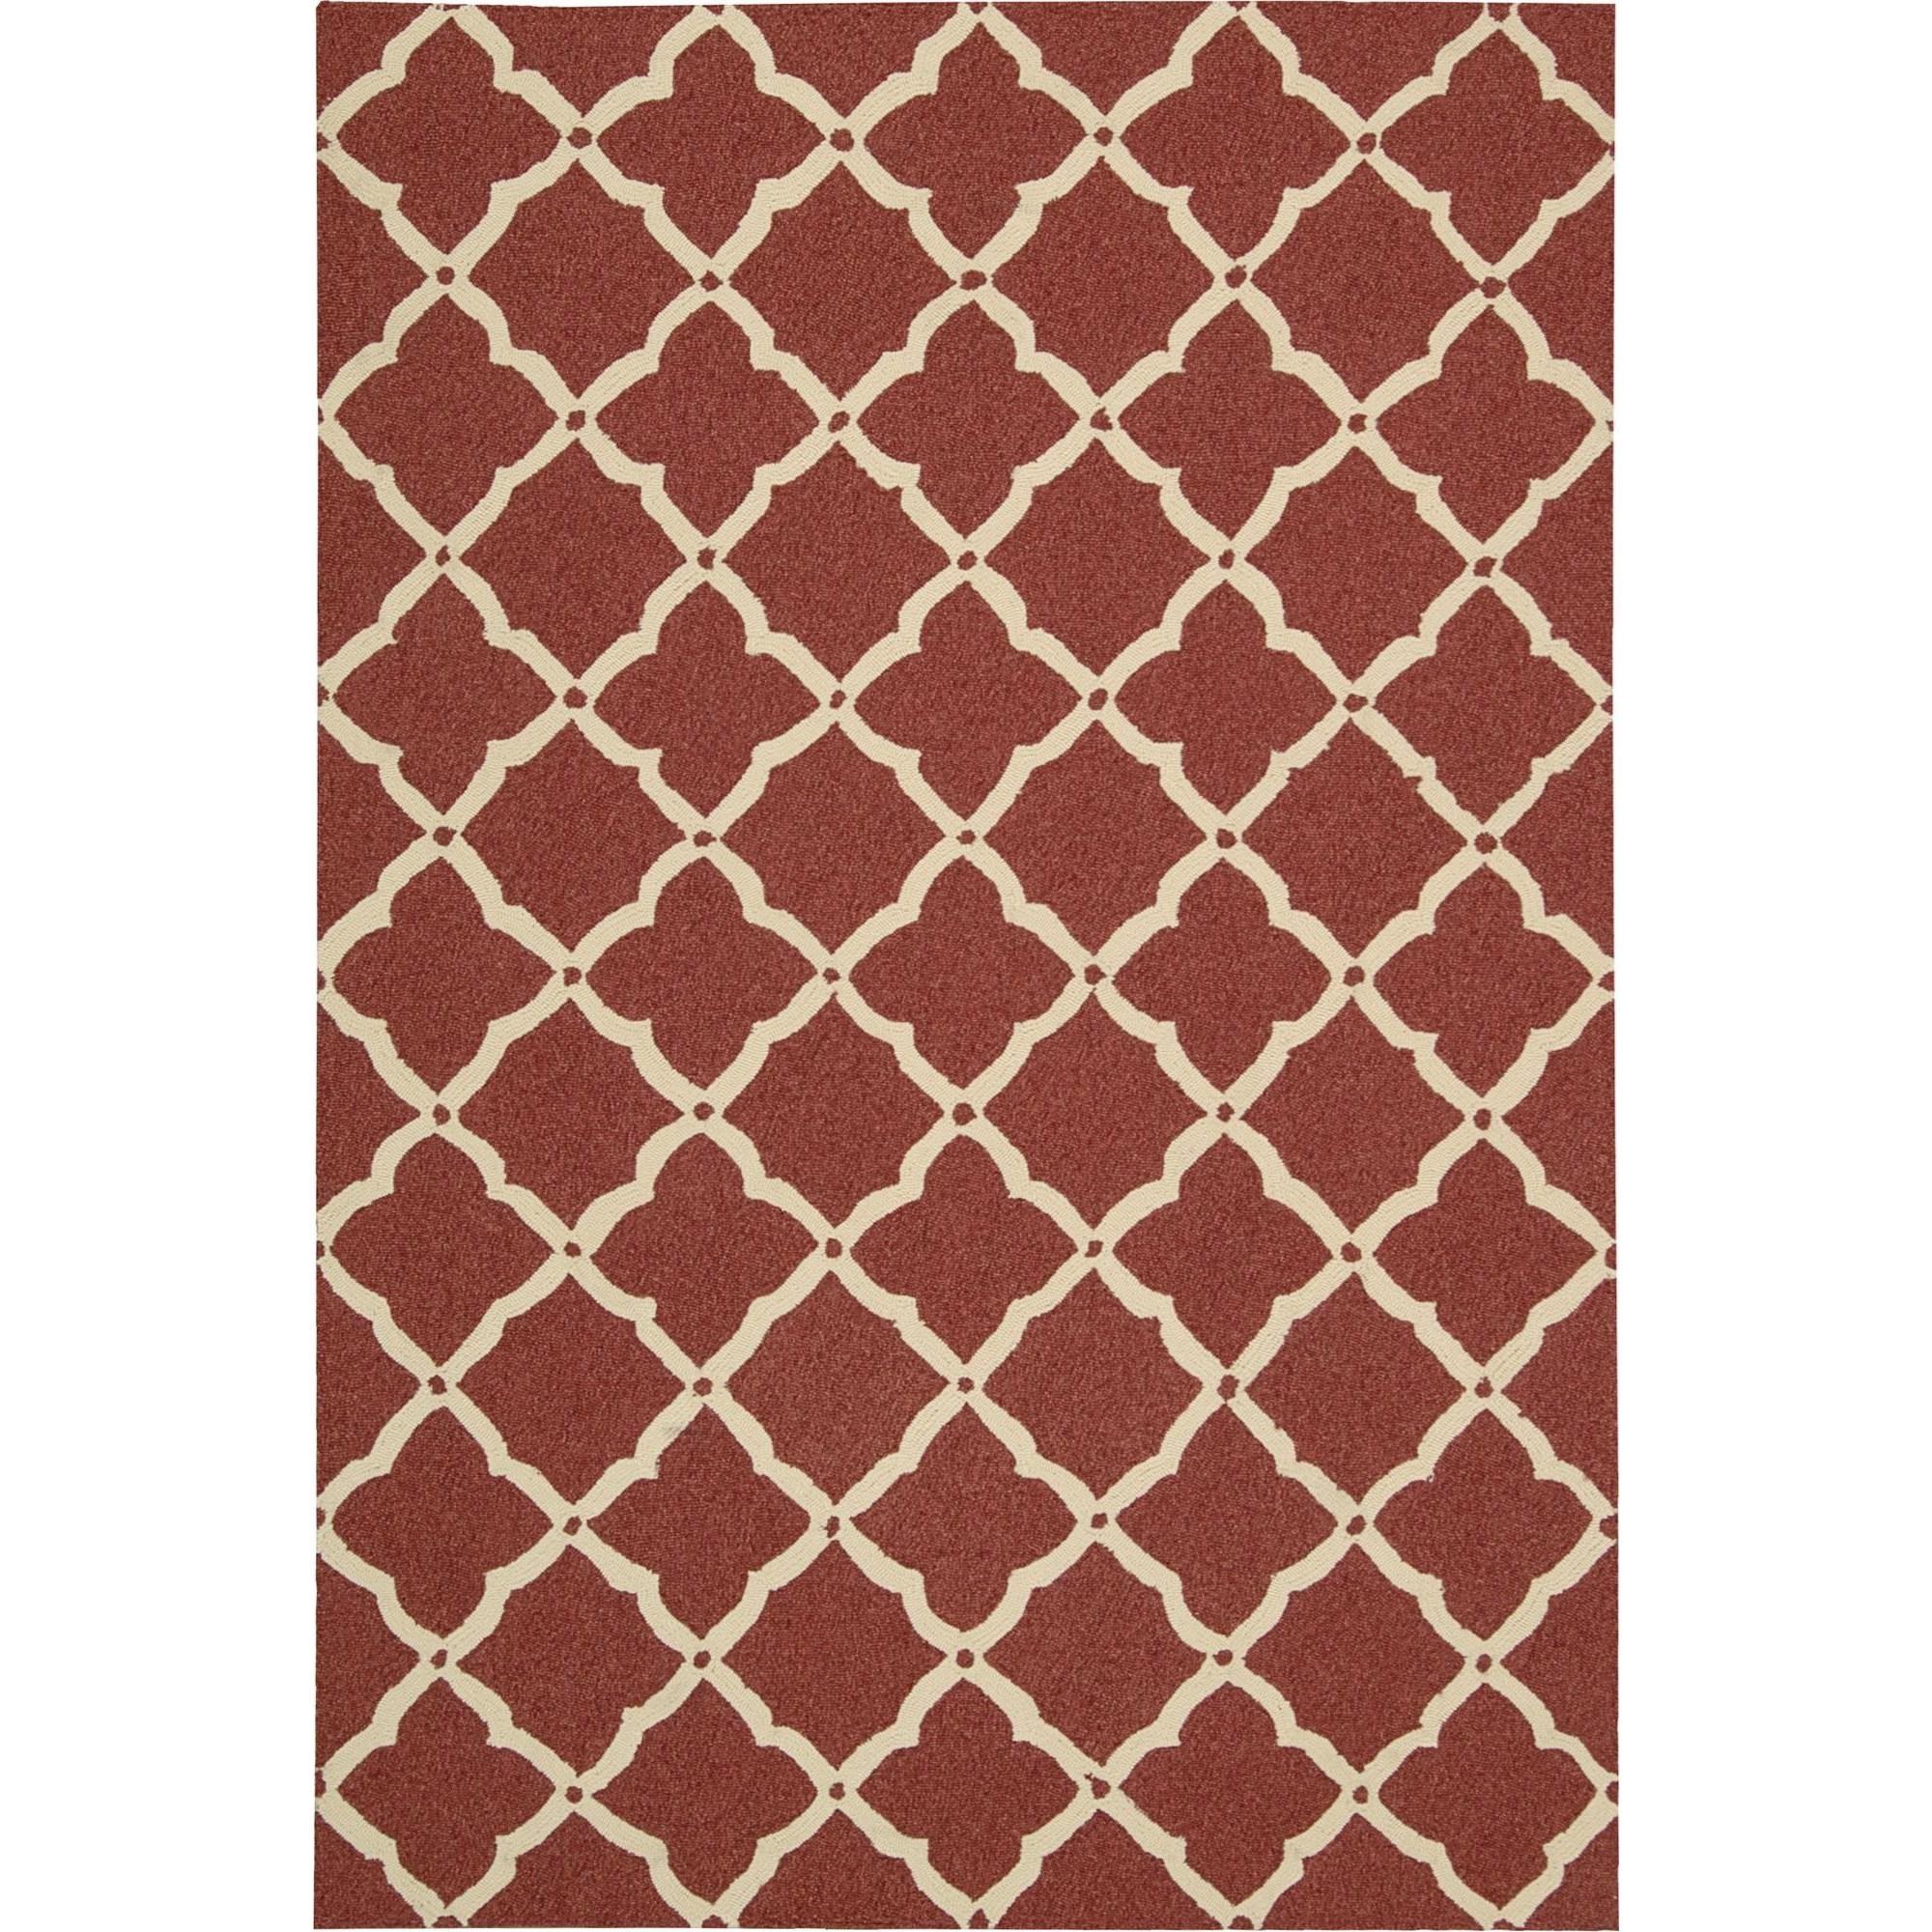 Nourison Portico 2' x 3' Red Area Rug - Item Number: 21726